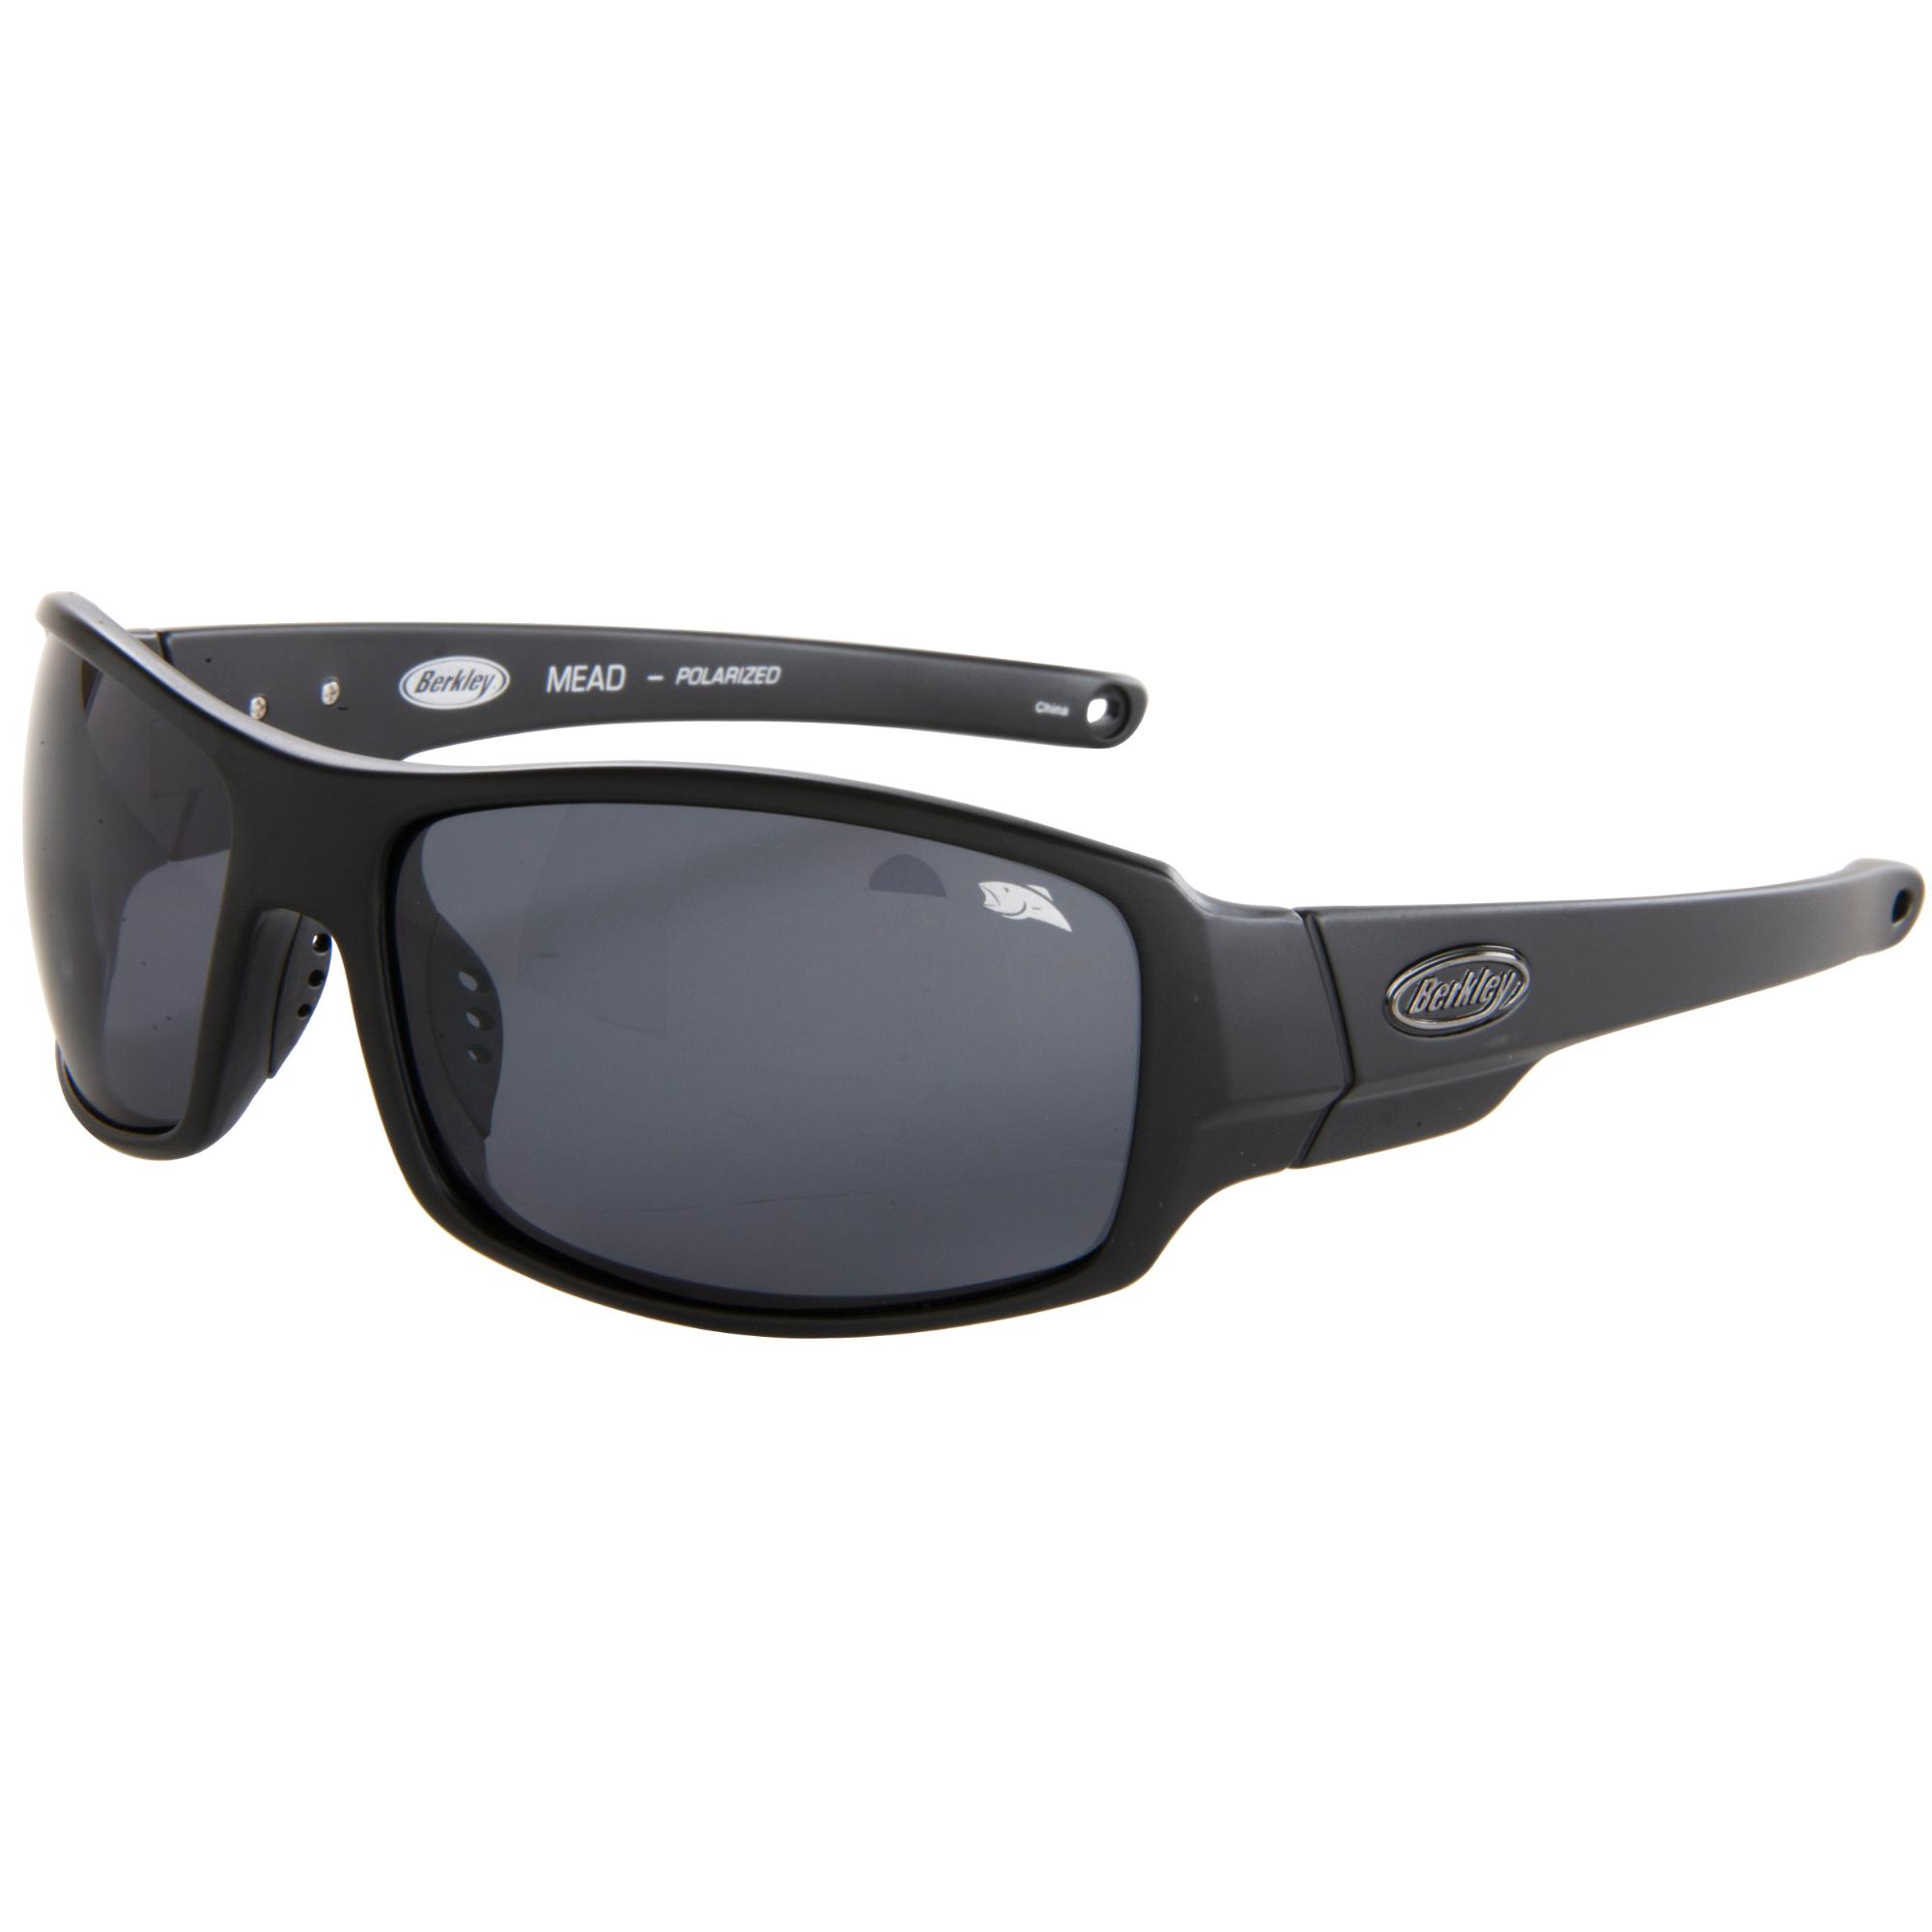 Berkley polarized fishing sunglasses magnifier louisiana for Polarized bifocal fishing sunglasses